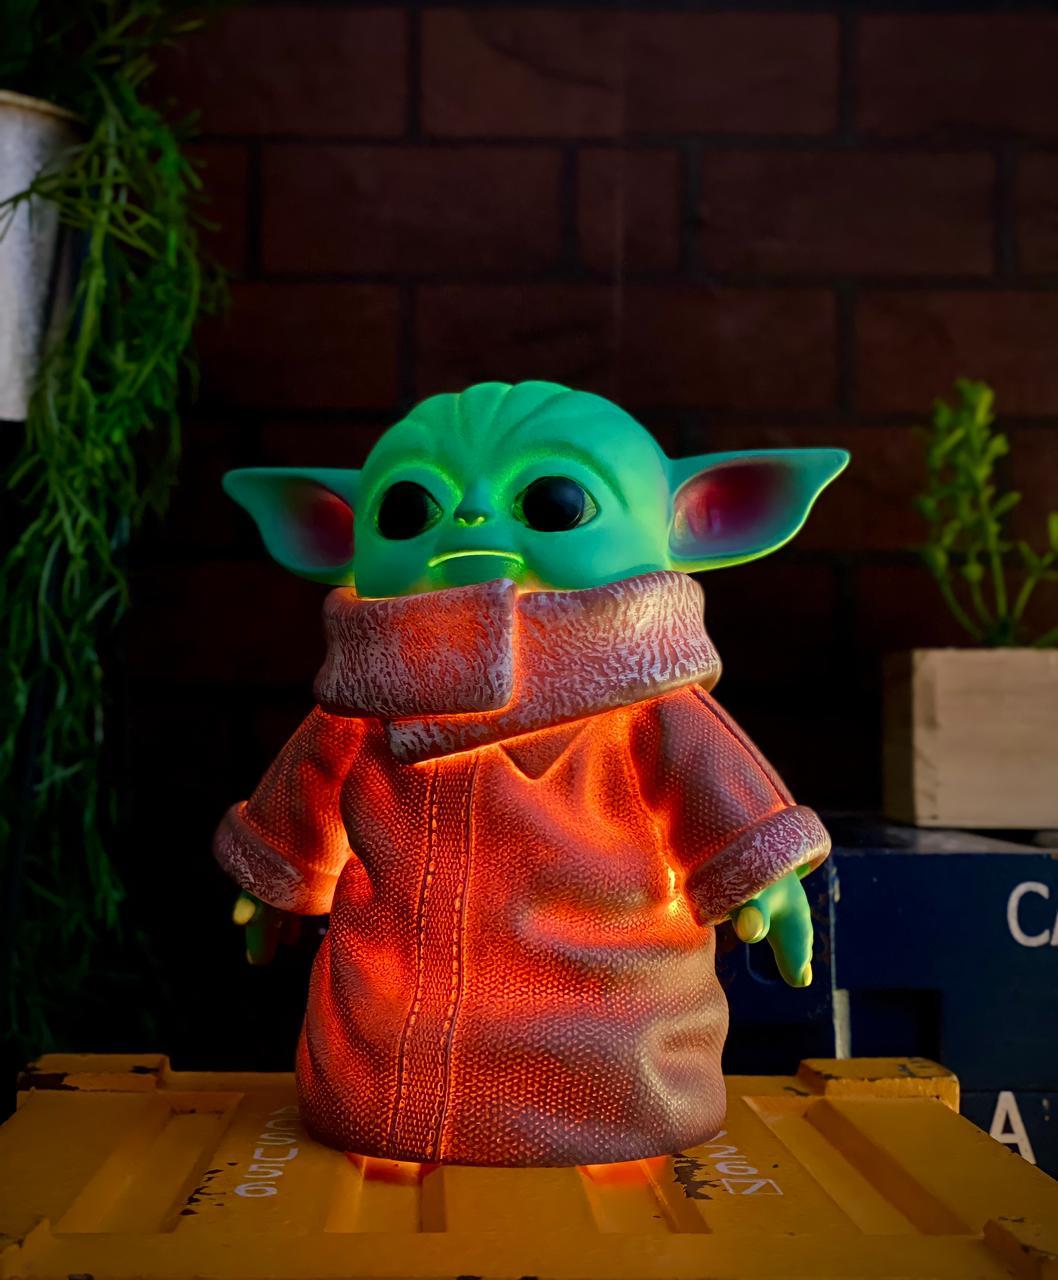 Luminária 3D Home Ornamento Geek Grogu Baby Yoda: O Mandaloriano The Mandalorian Star Wars